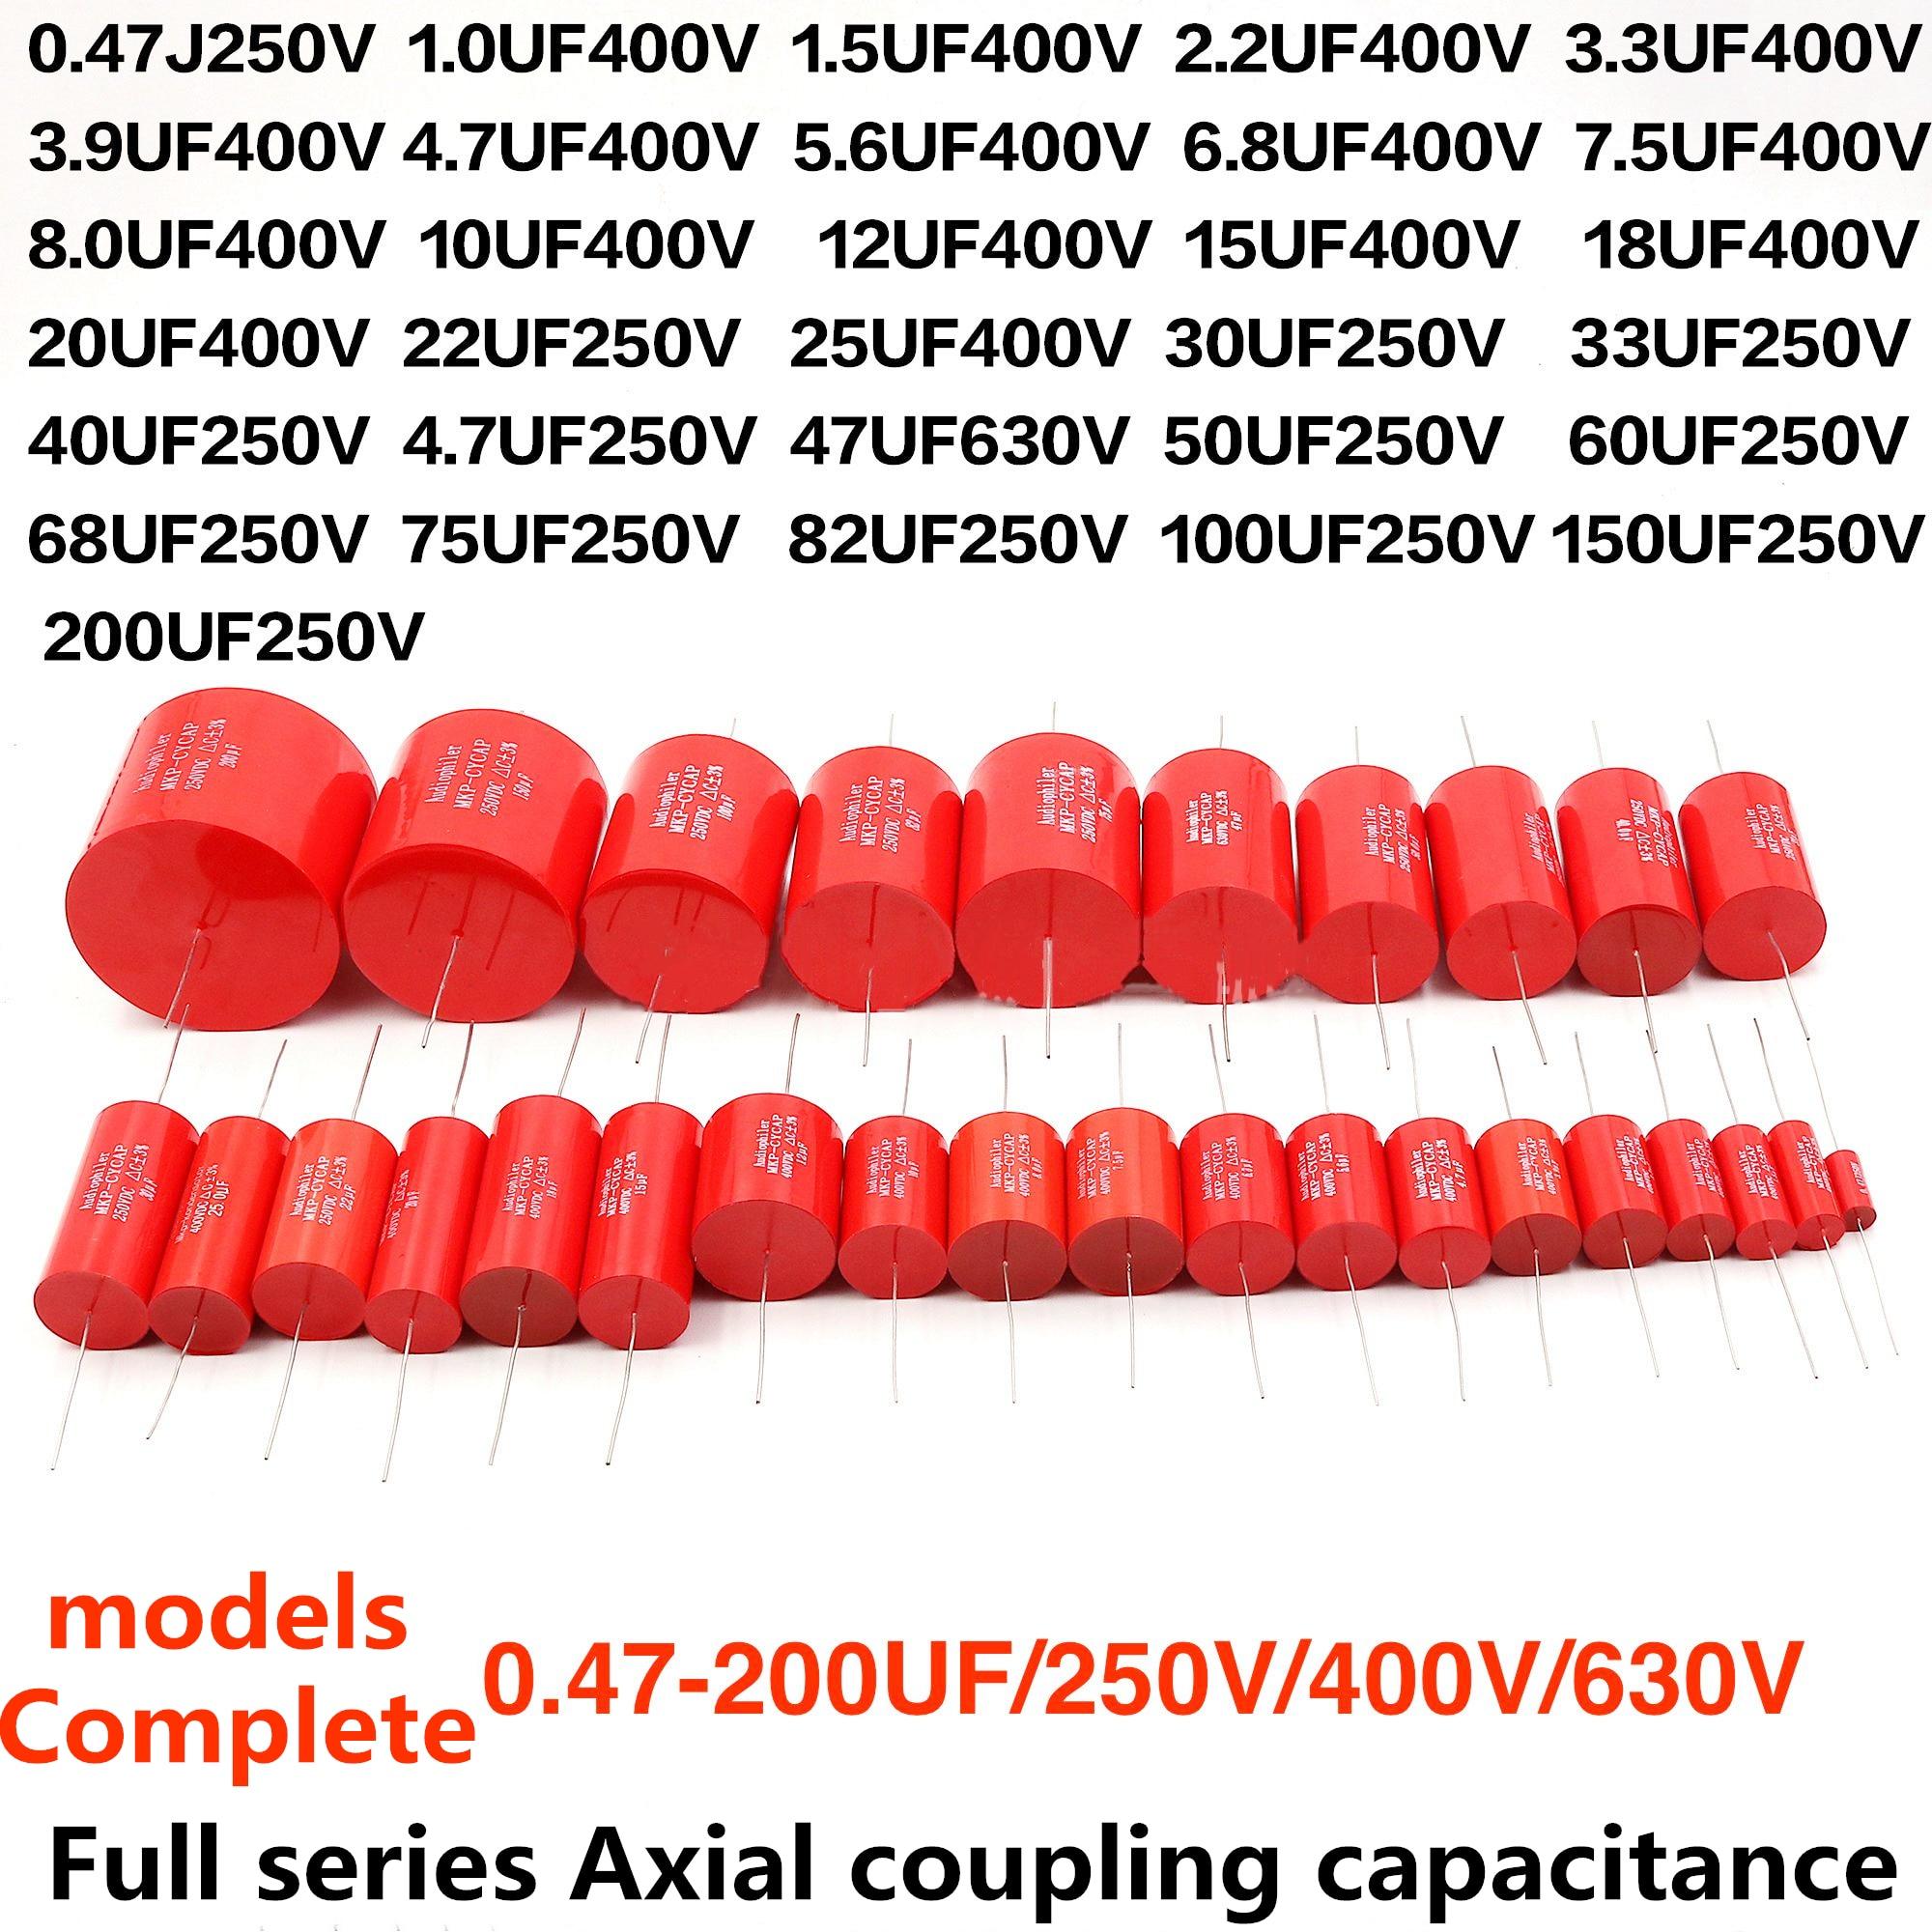 Audiophiler Mkp Capacitor Kondensotor HIFI Fever Electrodeless Capacitor Audio Capacito Metal Film Coupling Frequency Dividing